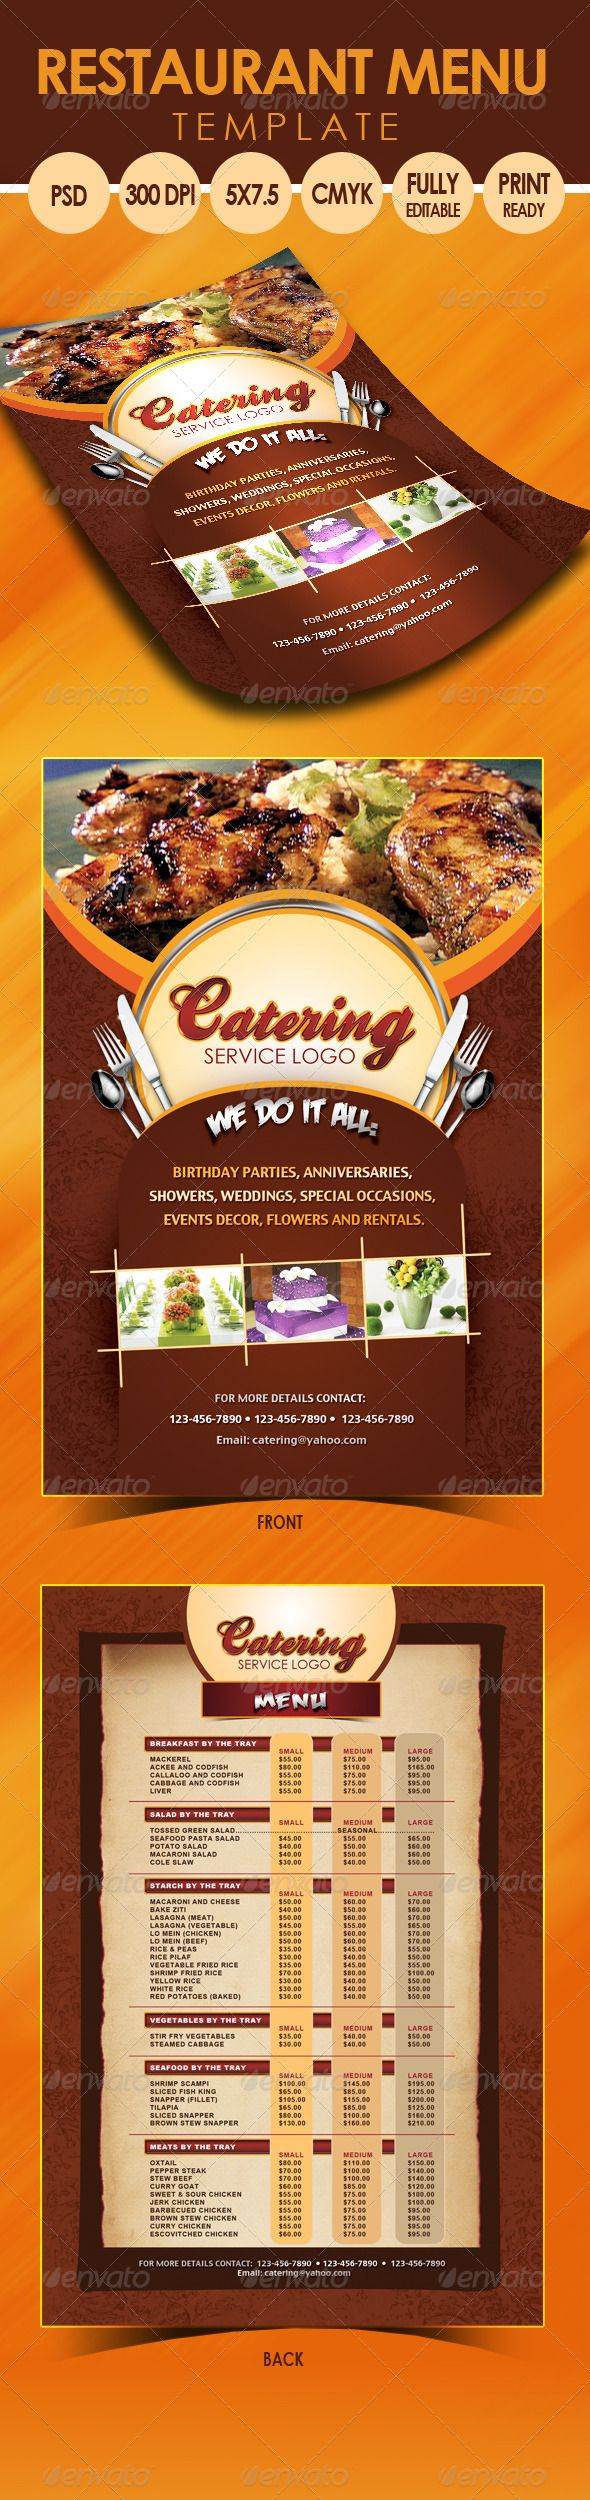 Catering Menu Template Flyer Pinterest Catering Menu Menu - Catering menu design templates